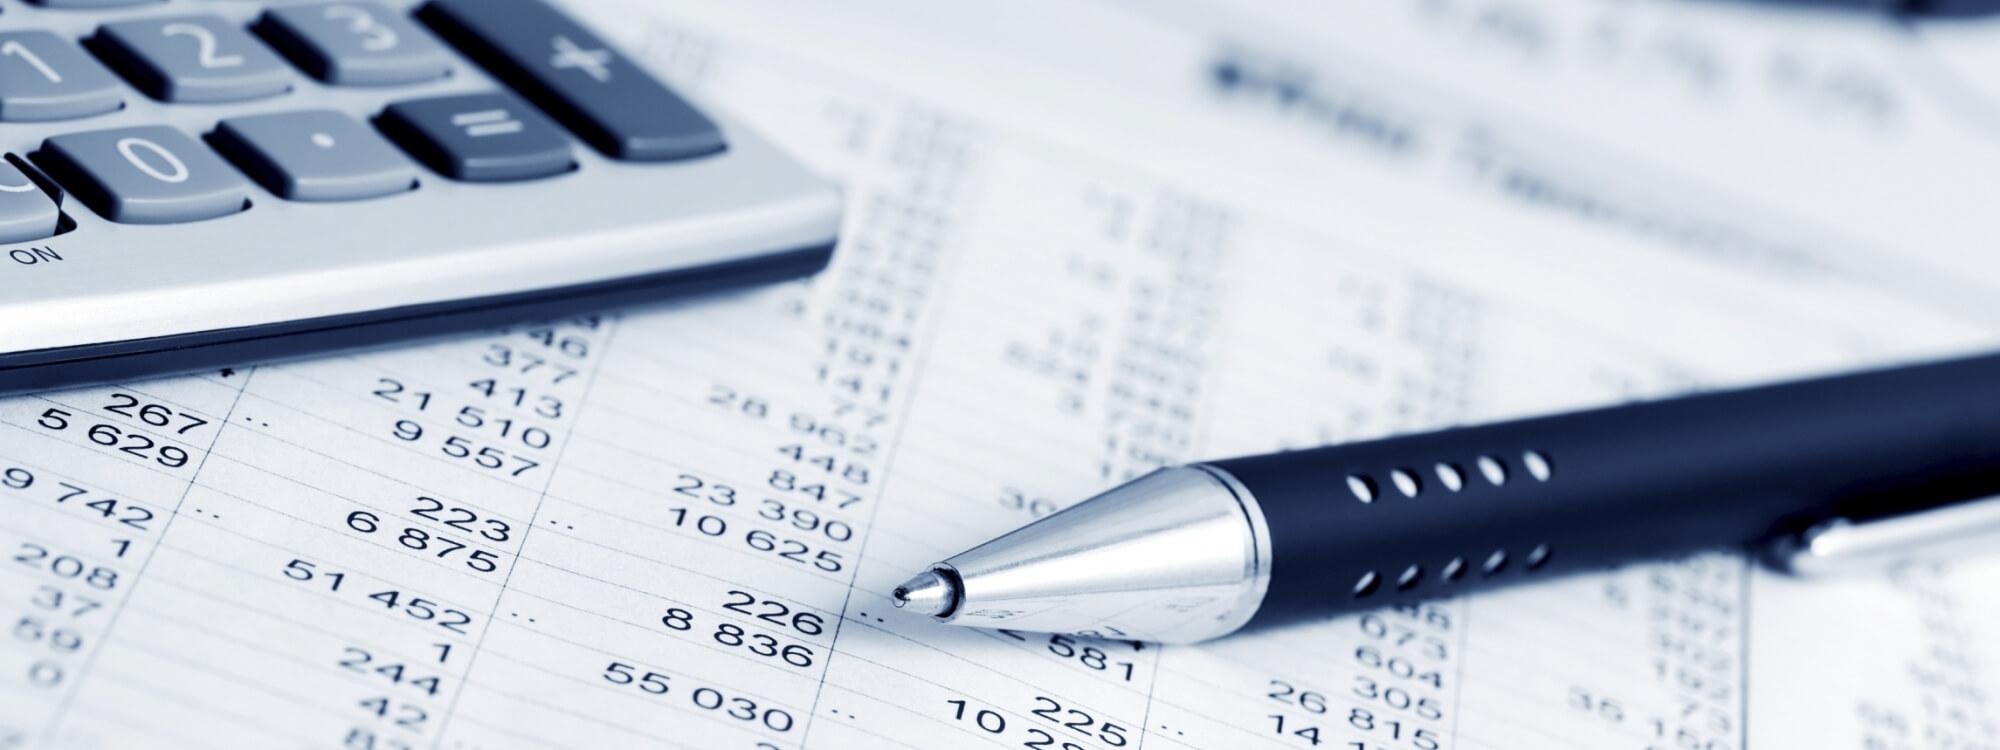 Learn Finance by TheMoneyVenture.com